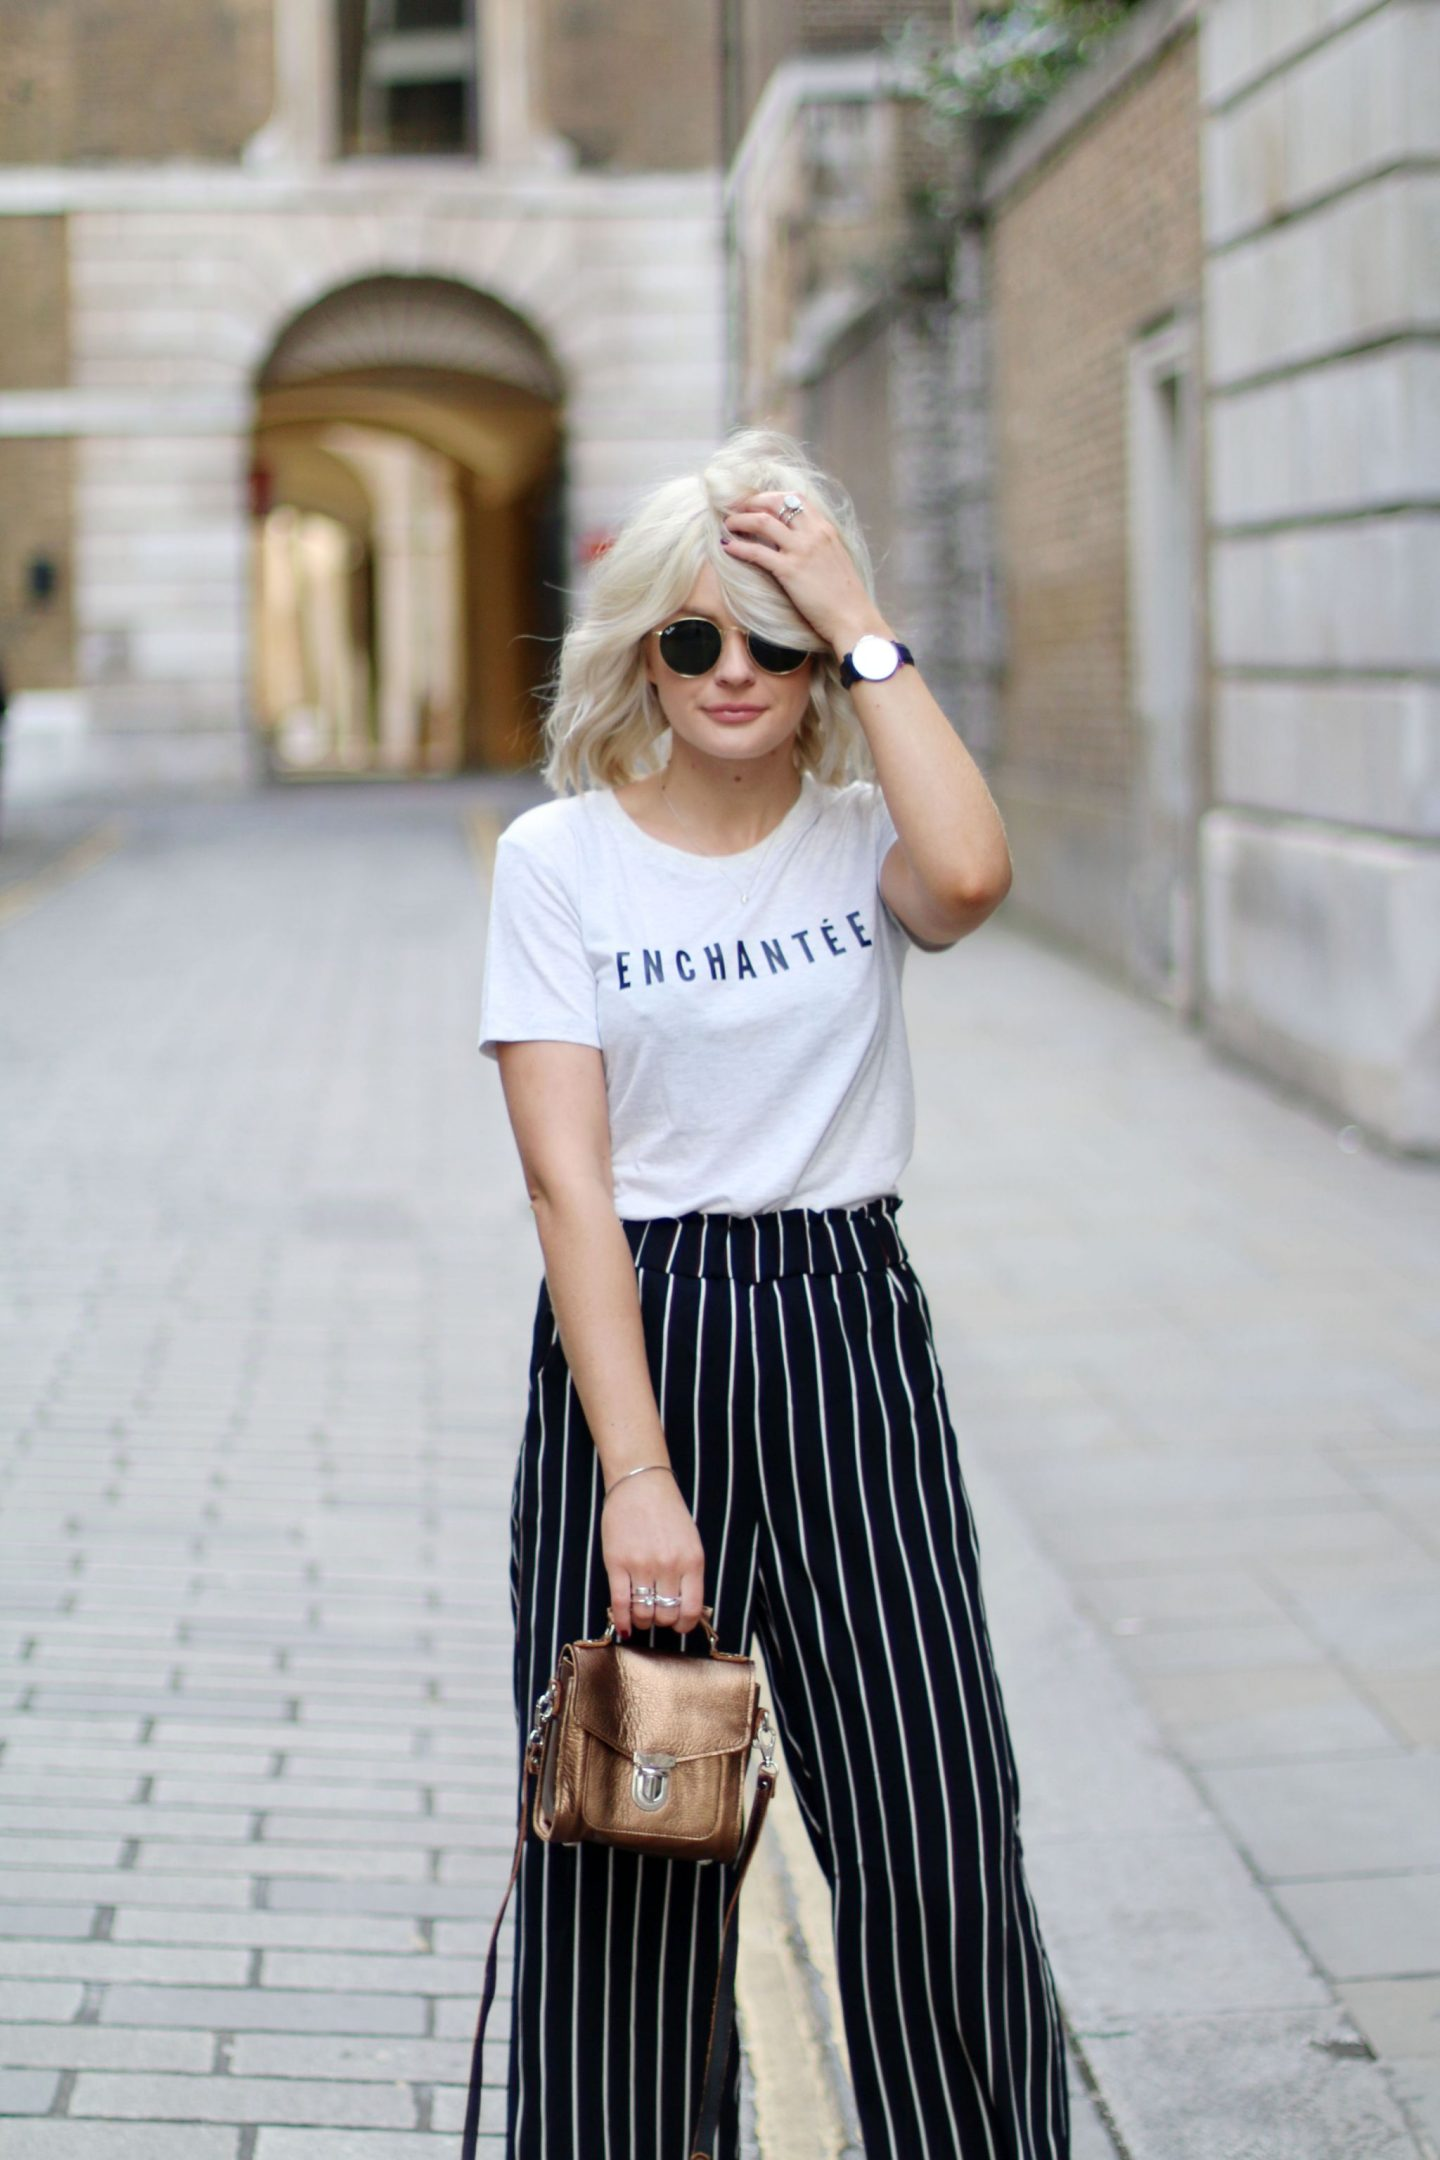 laura byrnes, lauras little locket, slogan tee, flared trouser, london, street style,